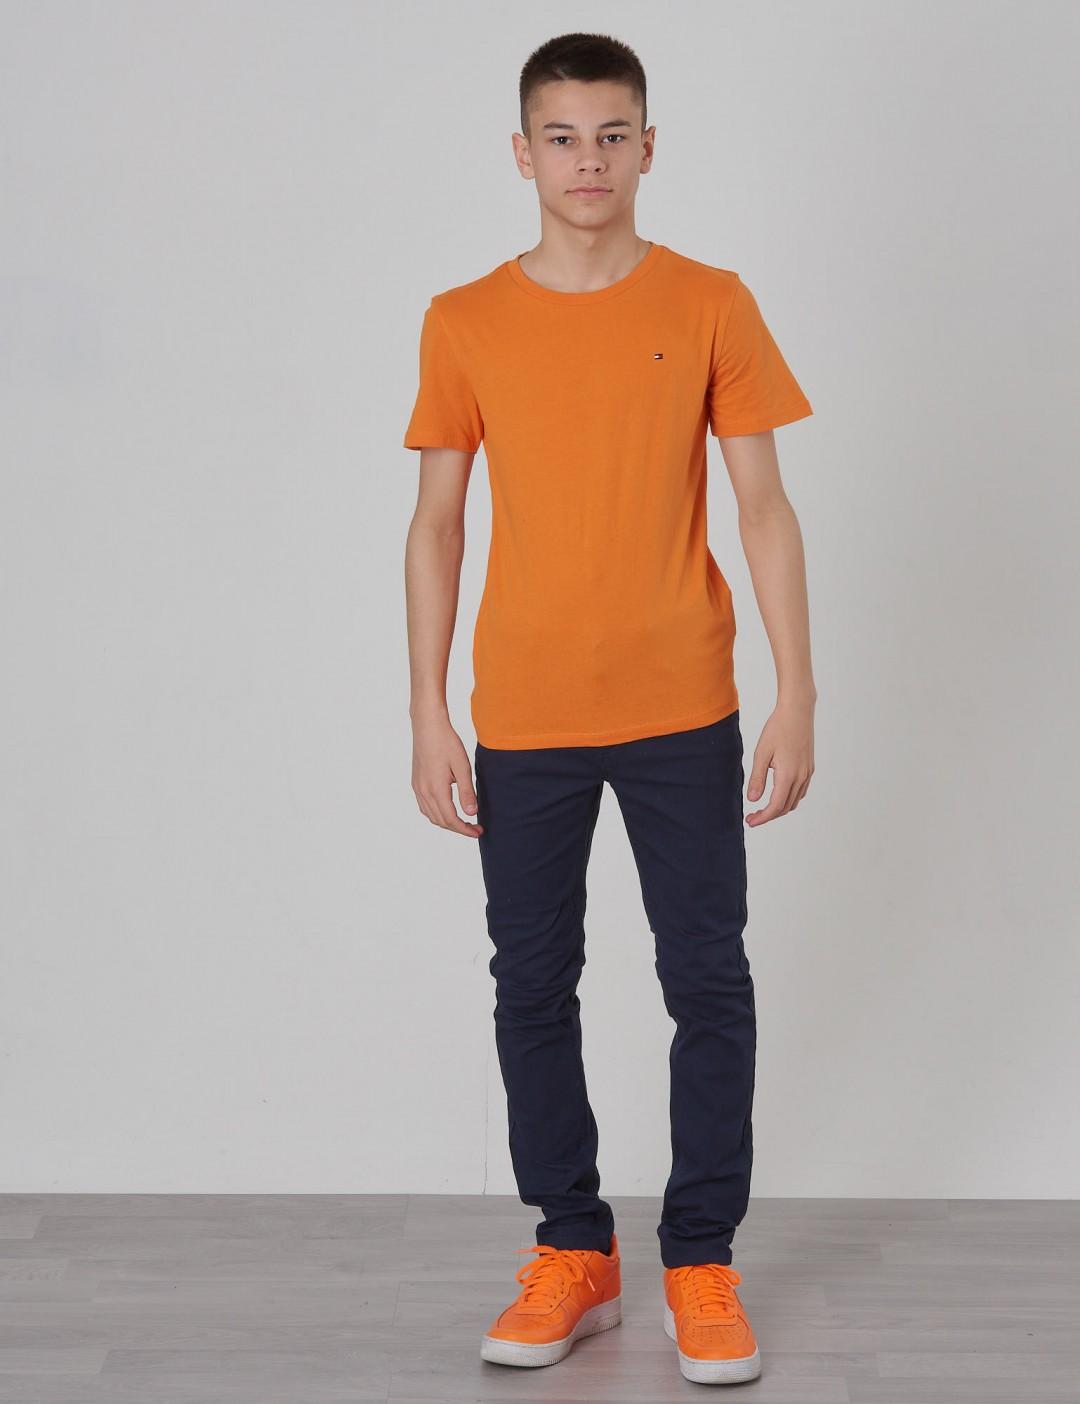 b52644324bd89 Original Cn Tee S s - Orange - Tommy Hilfiger